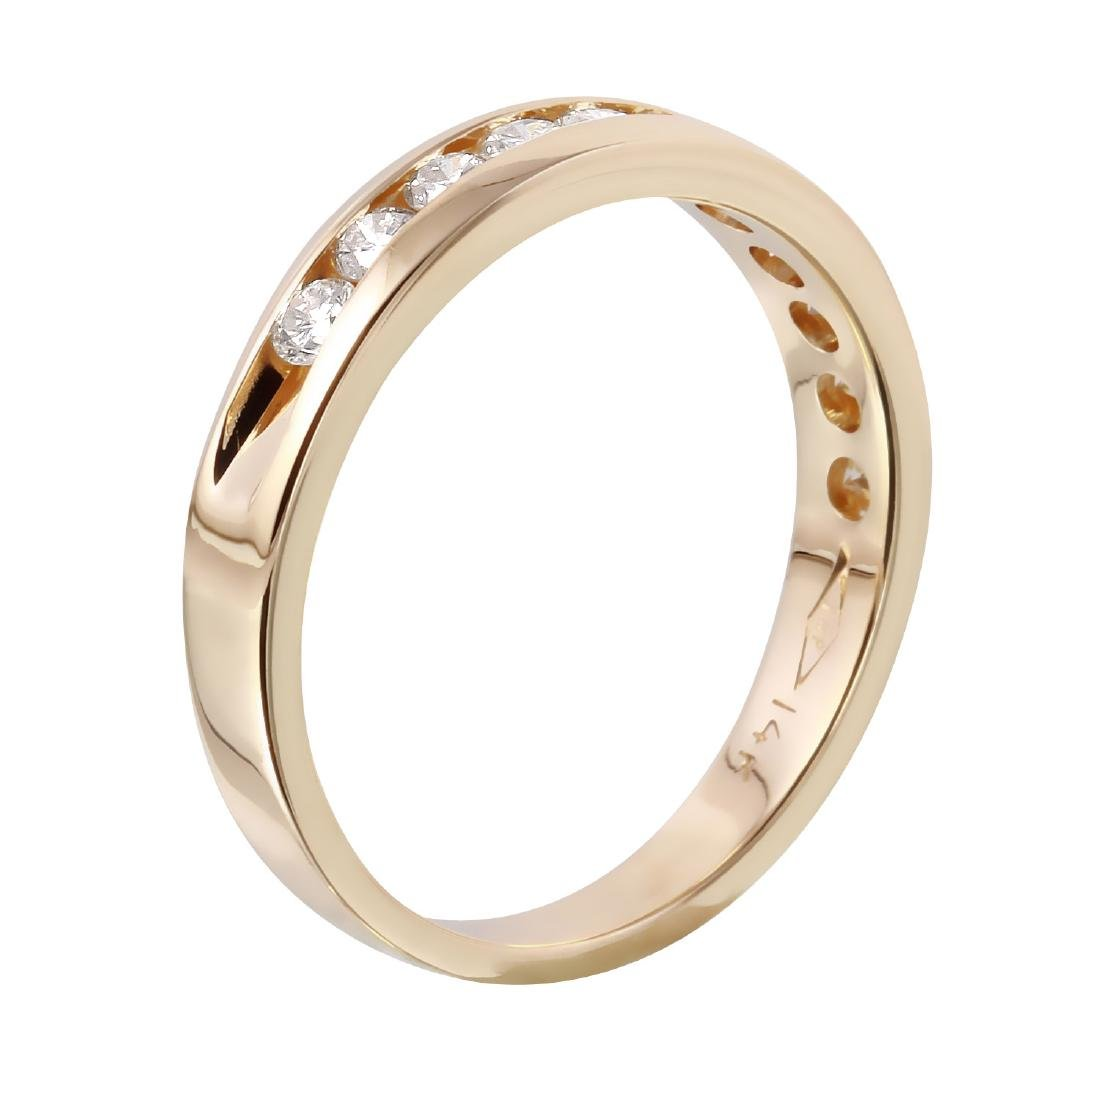 14KT Yellow Gold 0.45ctw Diamond Wedding Band Size 6.25 - 4